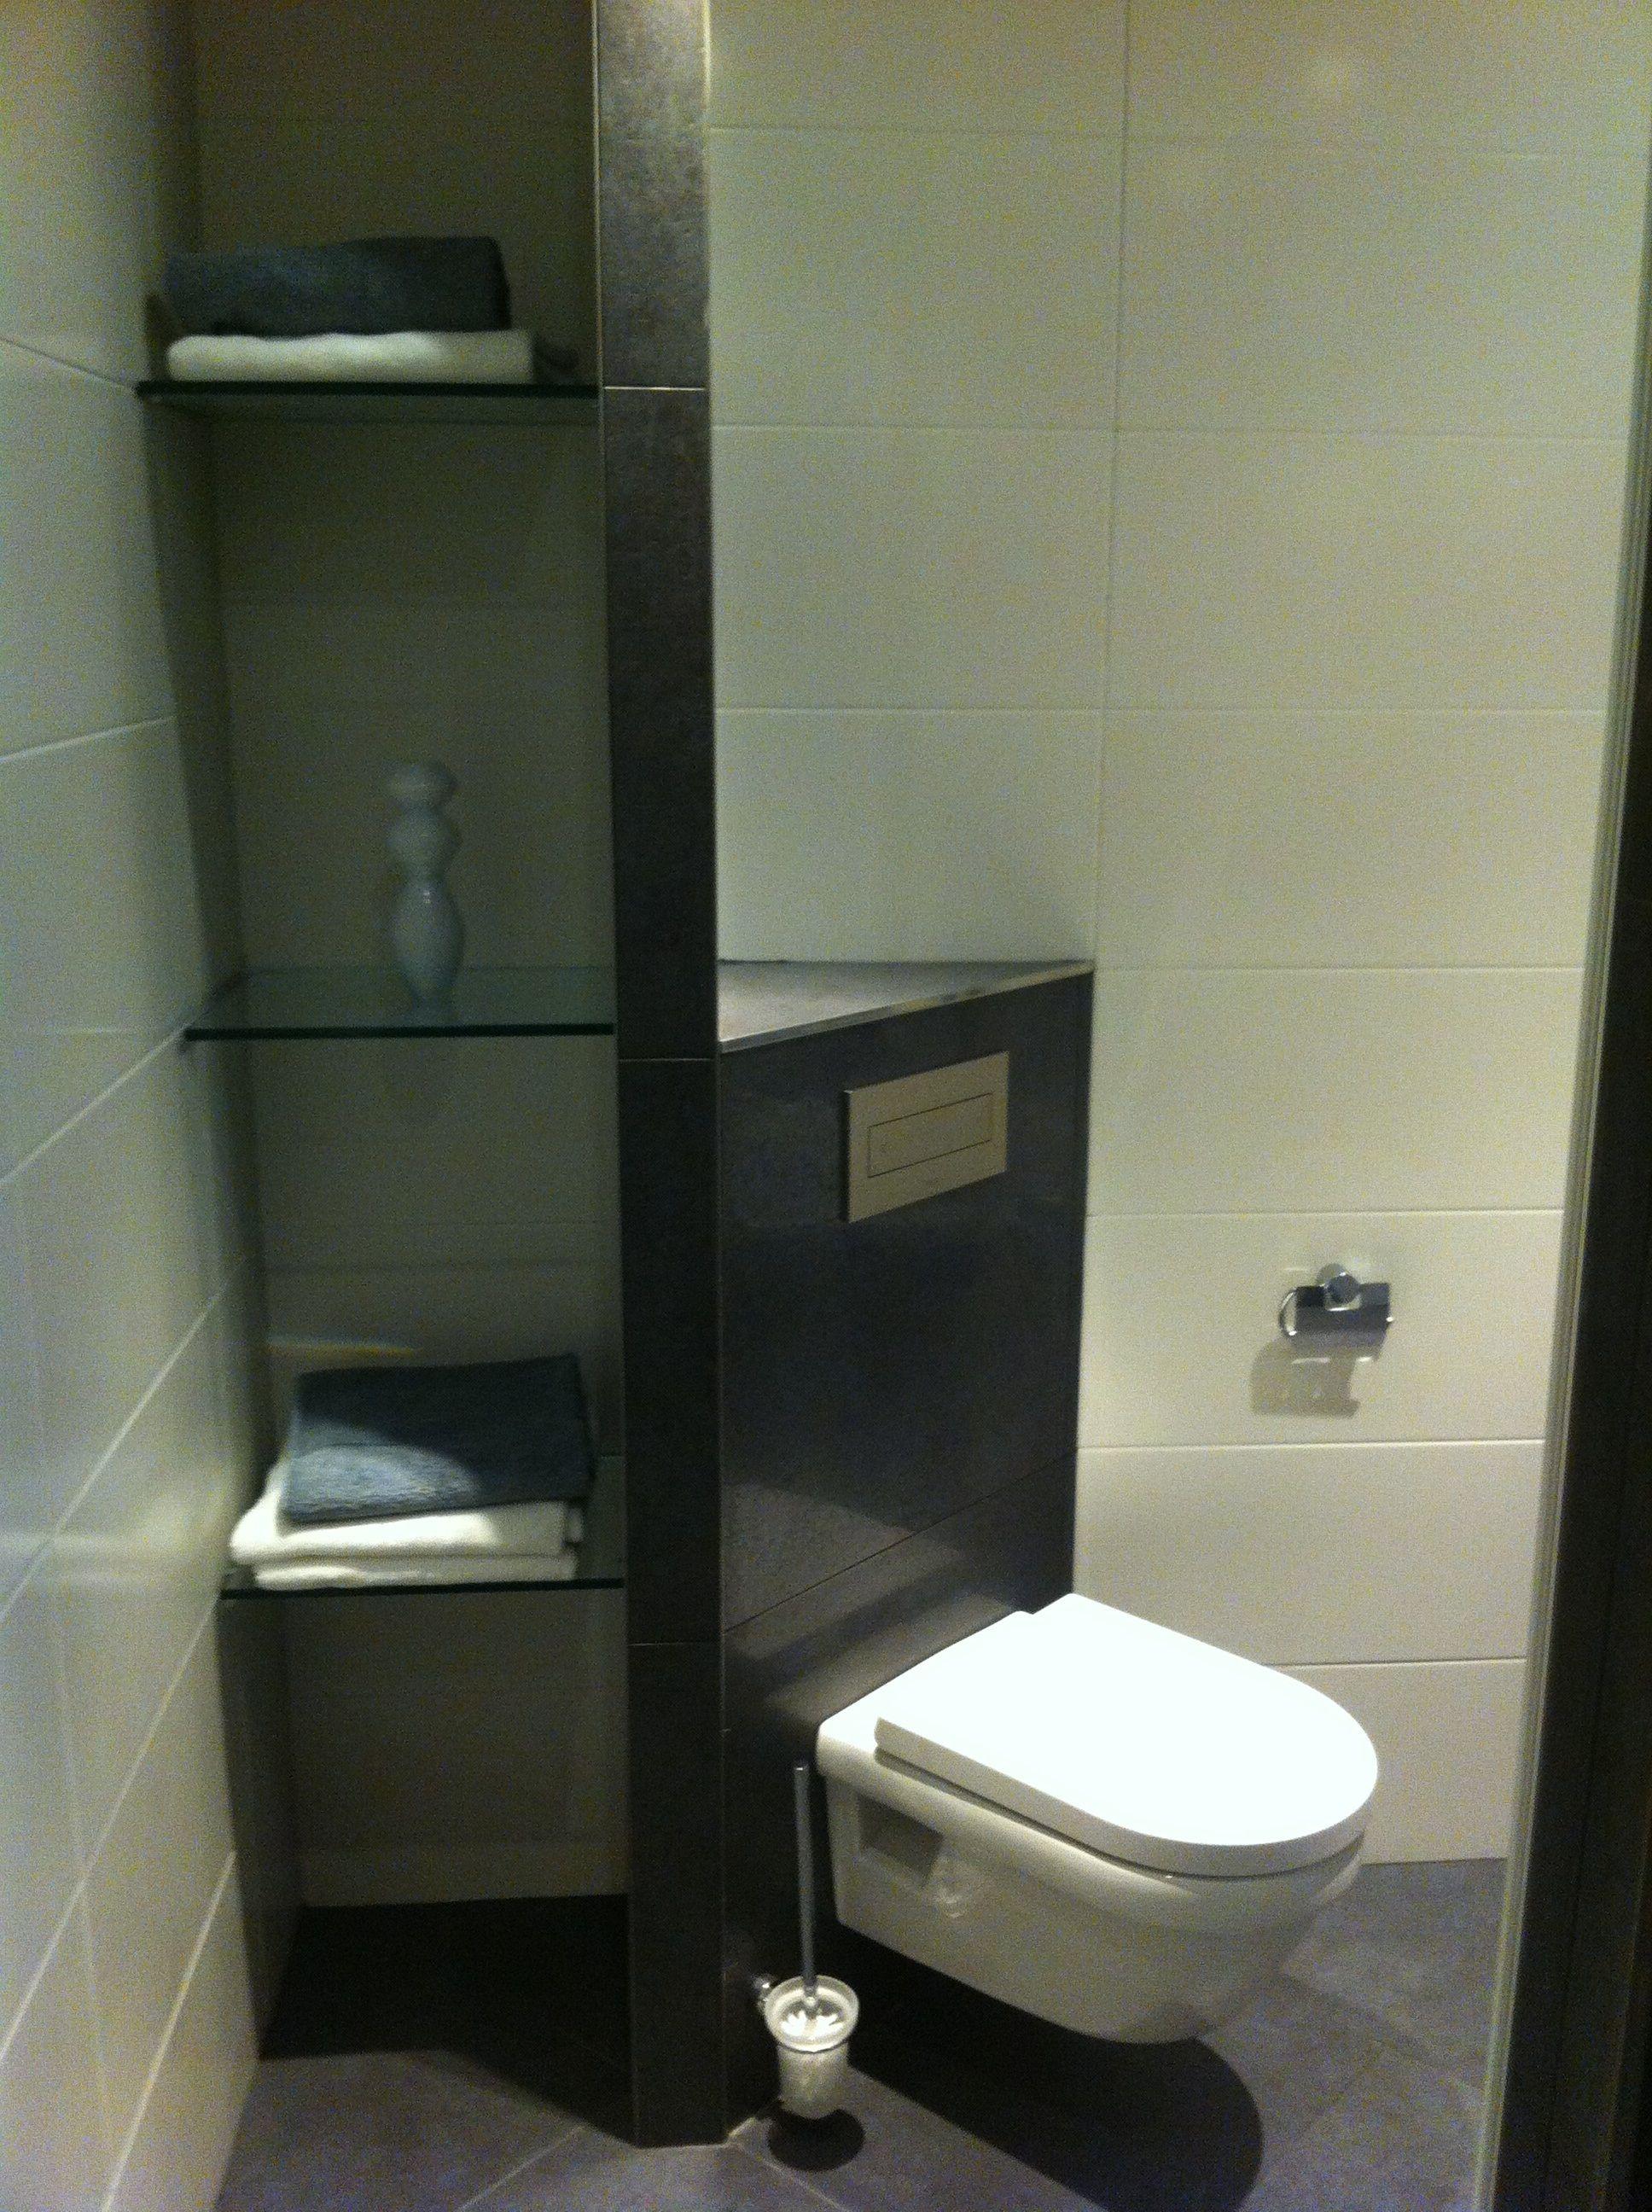 Hoektoilet Net Opbergruimte Badkamer Badkamer Inspiratie Toilet